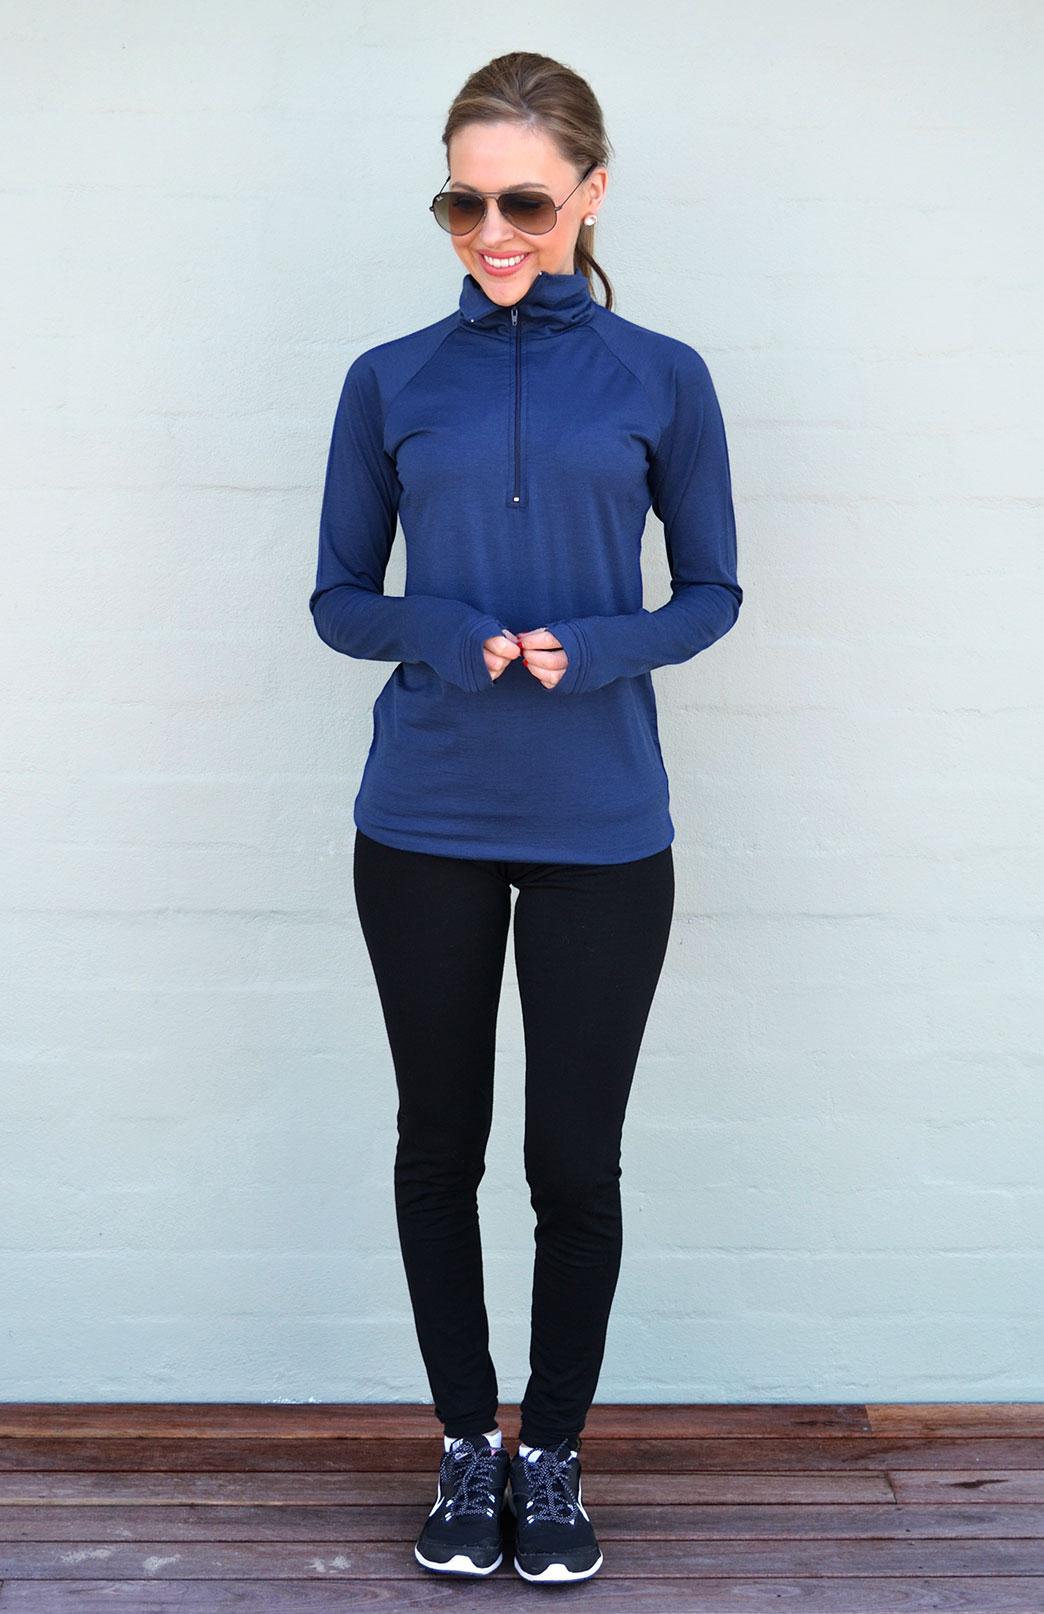 Zip Neck Top - Midweight (200g) - Women's Indigo Blue Zip Neck Pull Over Style Top with thumb holes - Smitten Merino Tasmania Australia